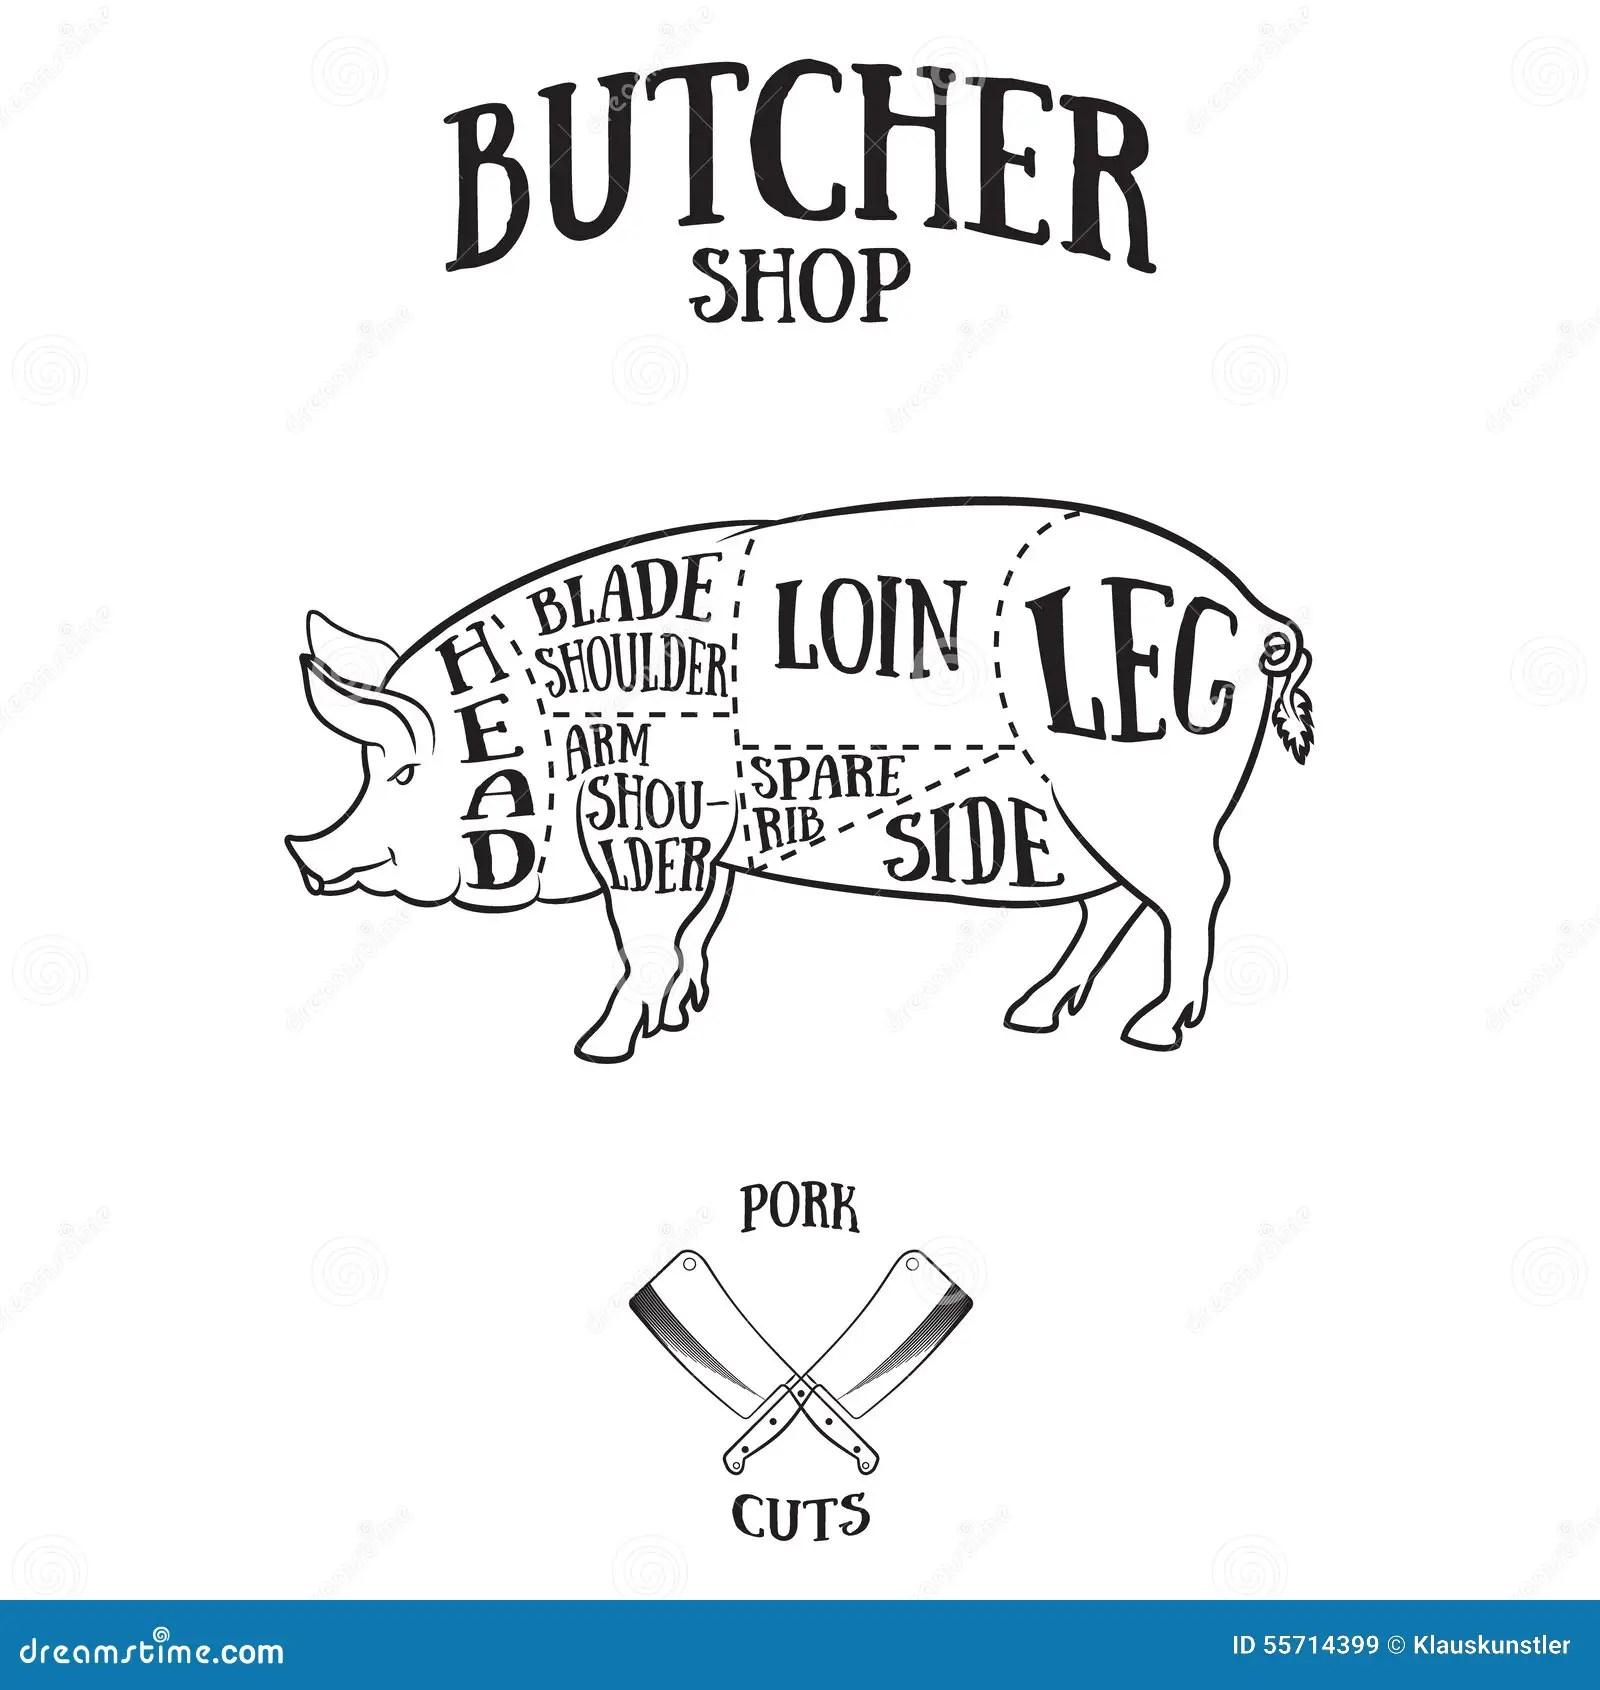 Butcher Cuts Scheme Of Pork Stock Vector